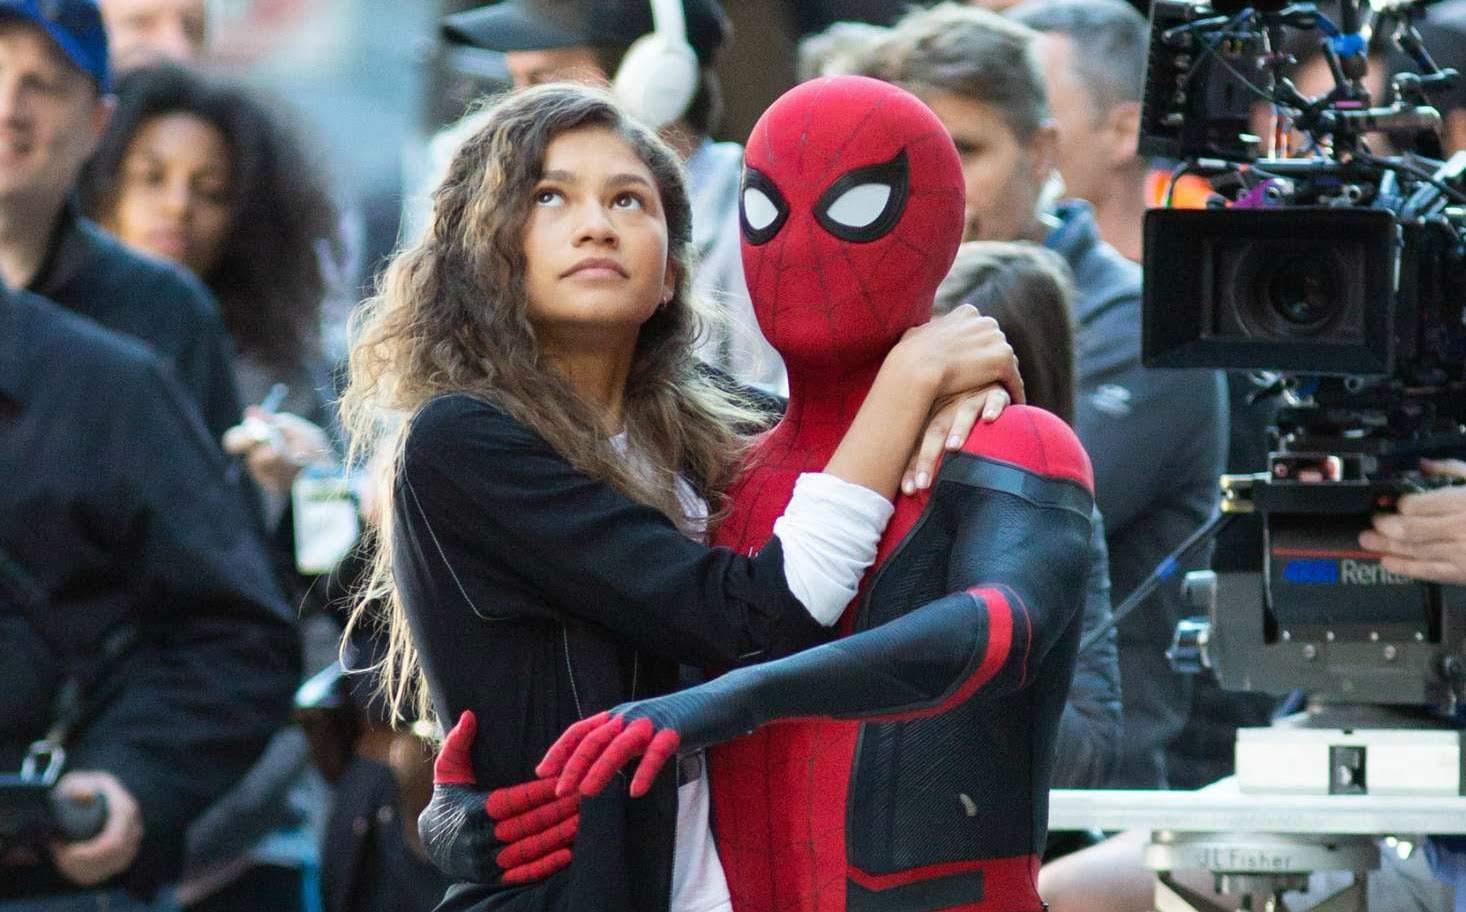 Spider-Man: Far From Home Trailer Coming This Weekend : トム・ホランド主演の「スパイダーマン」シリーズの第2弾「ファー・フロム・ホーム」が、この週末に予告編を初公開 ! !